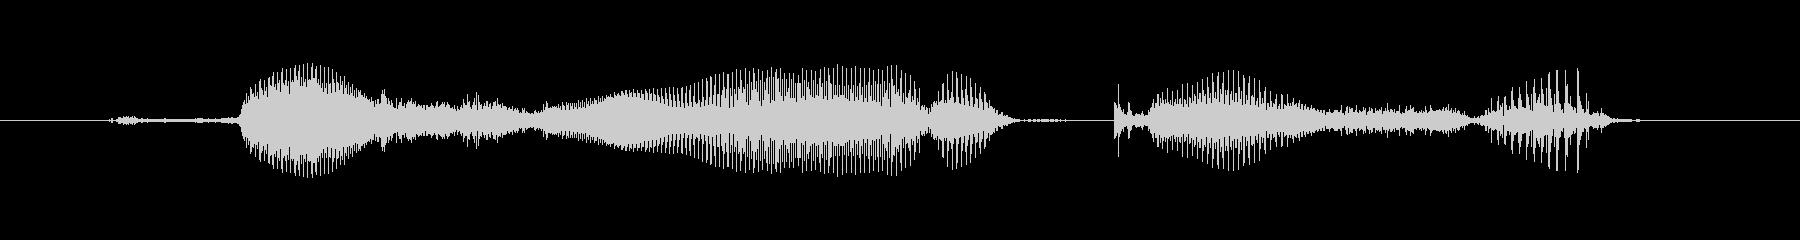 PCR検査の未再生の波形